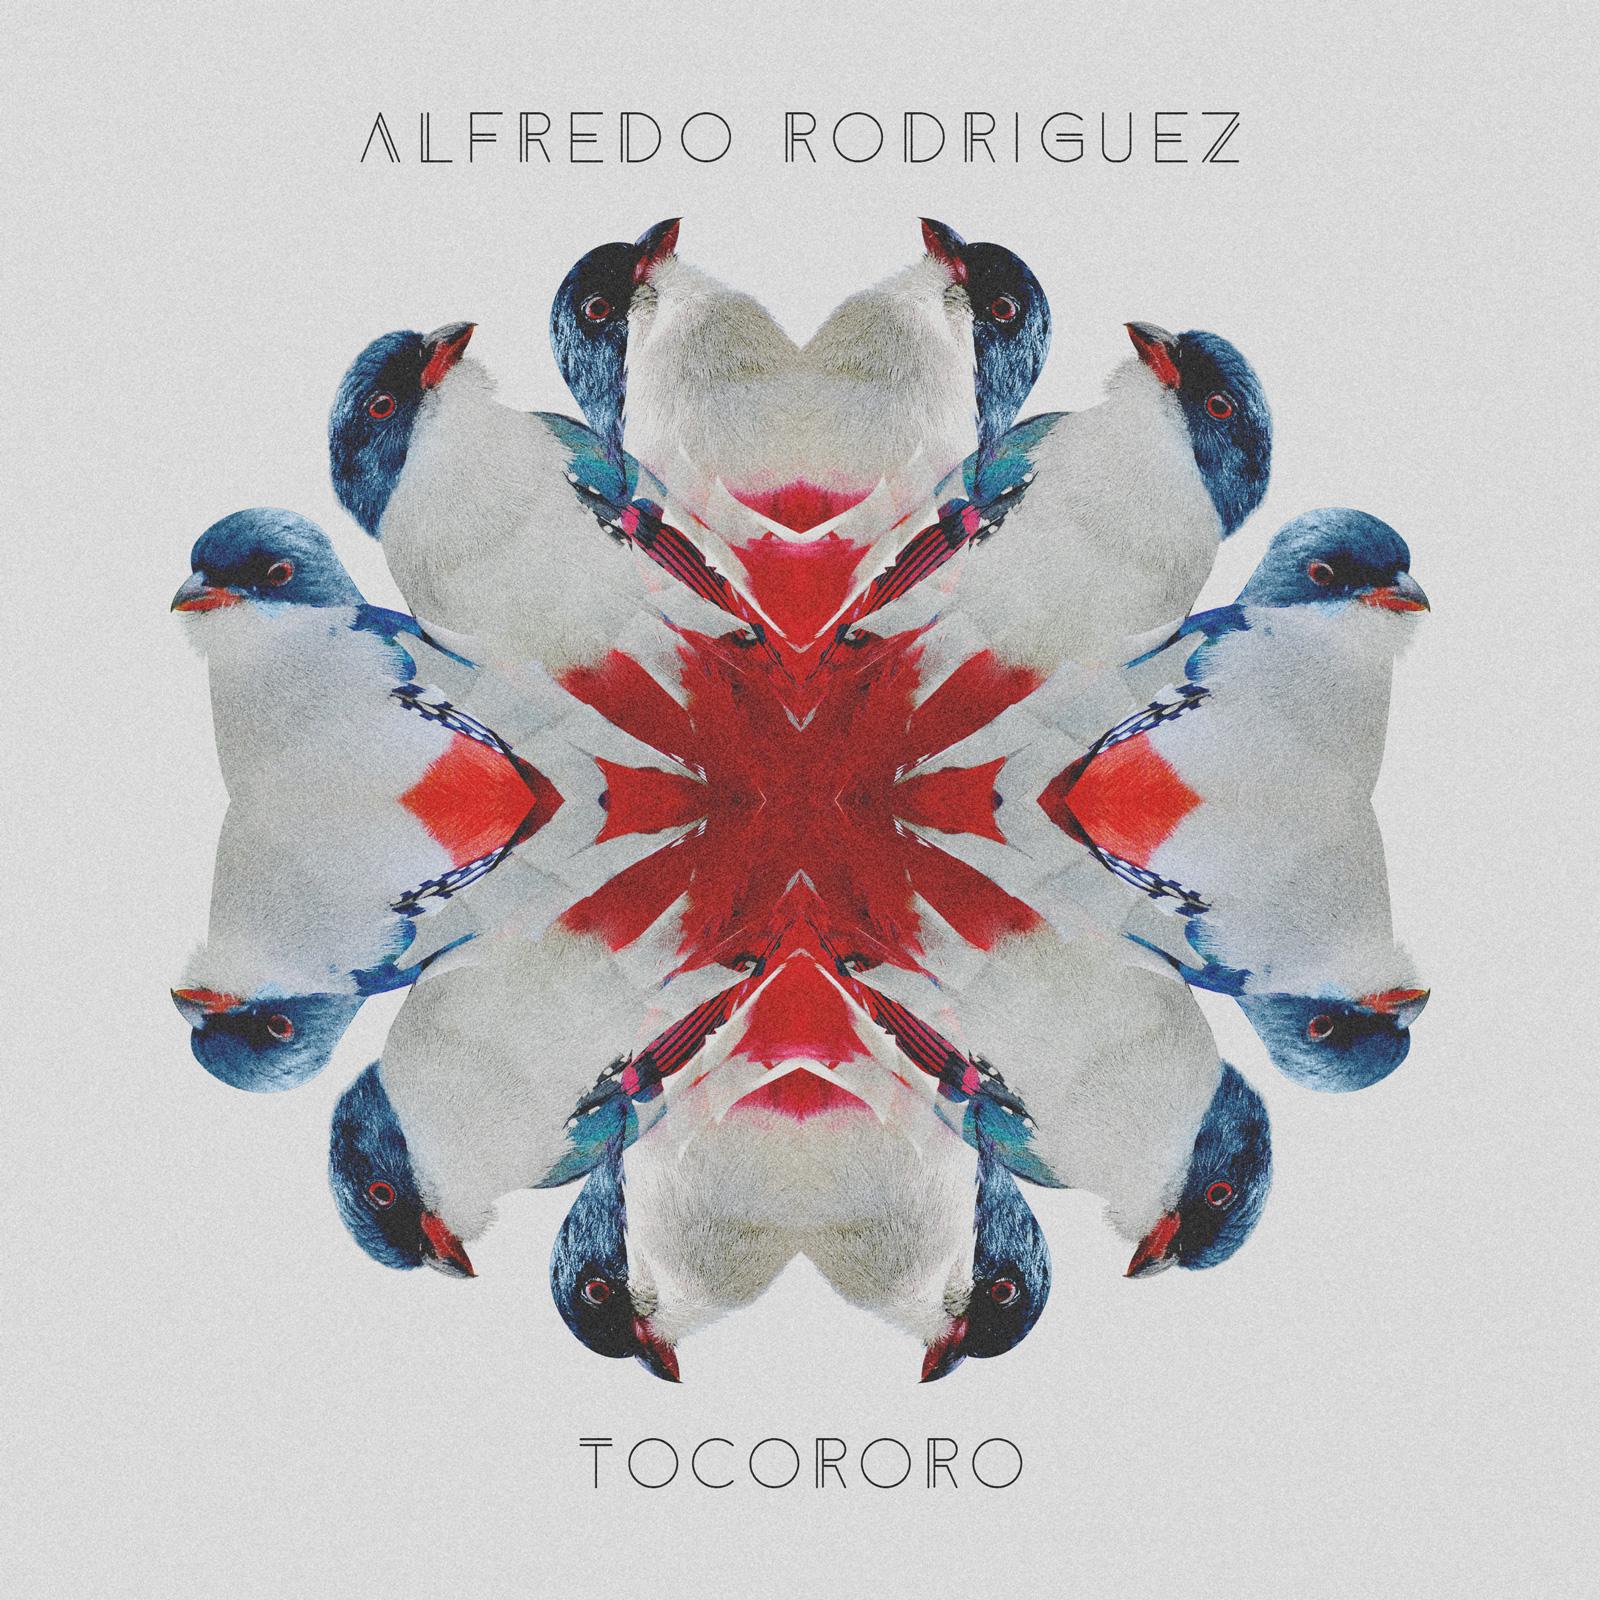 1600px_alfredoRodriguez_tocororo_cover.jpg